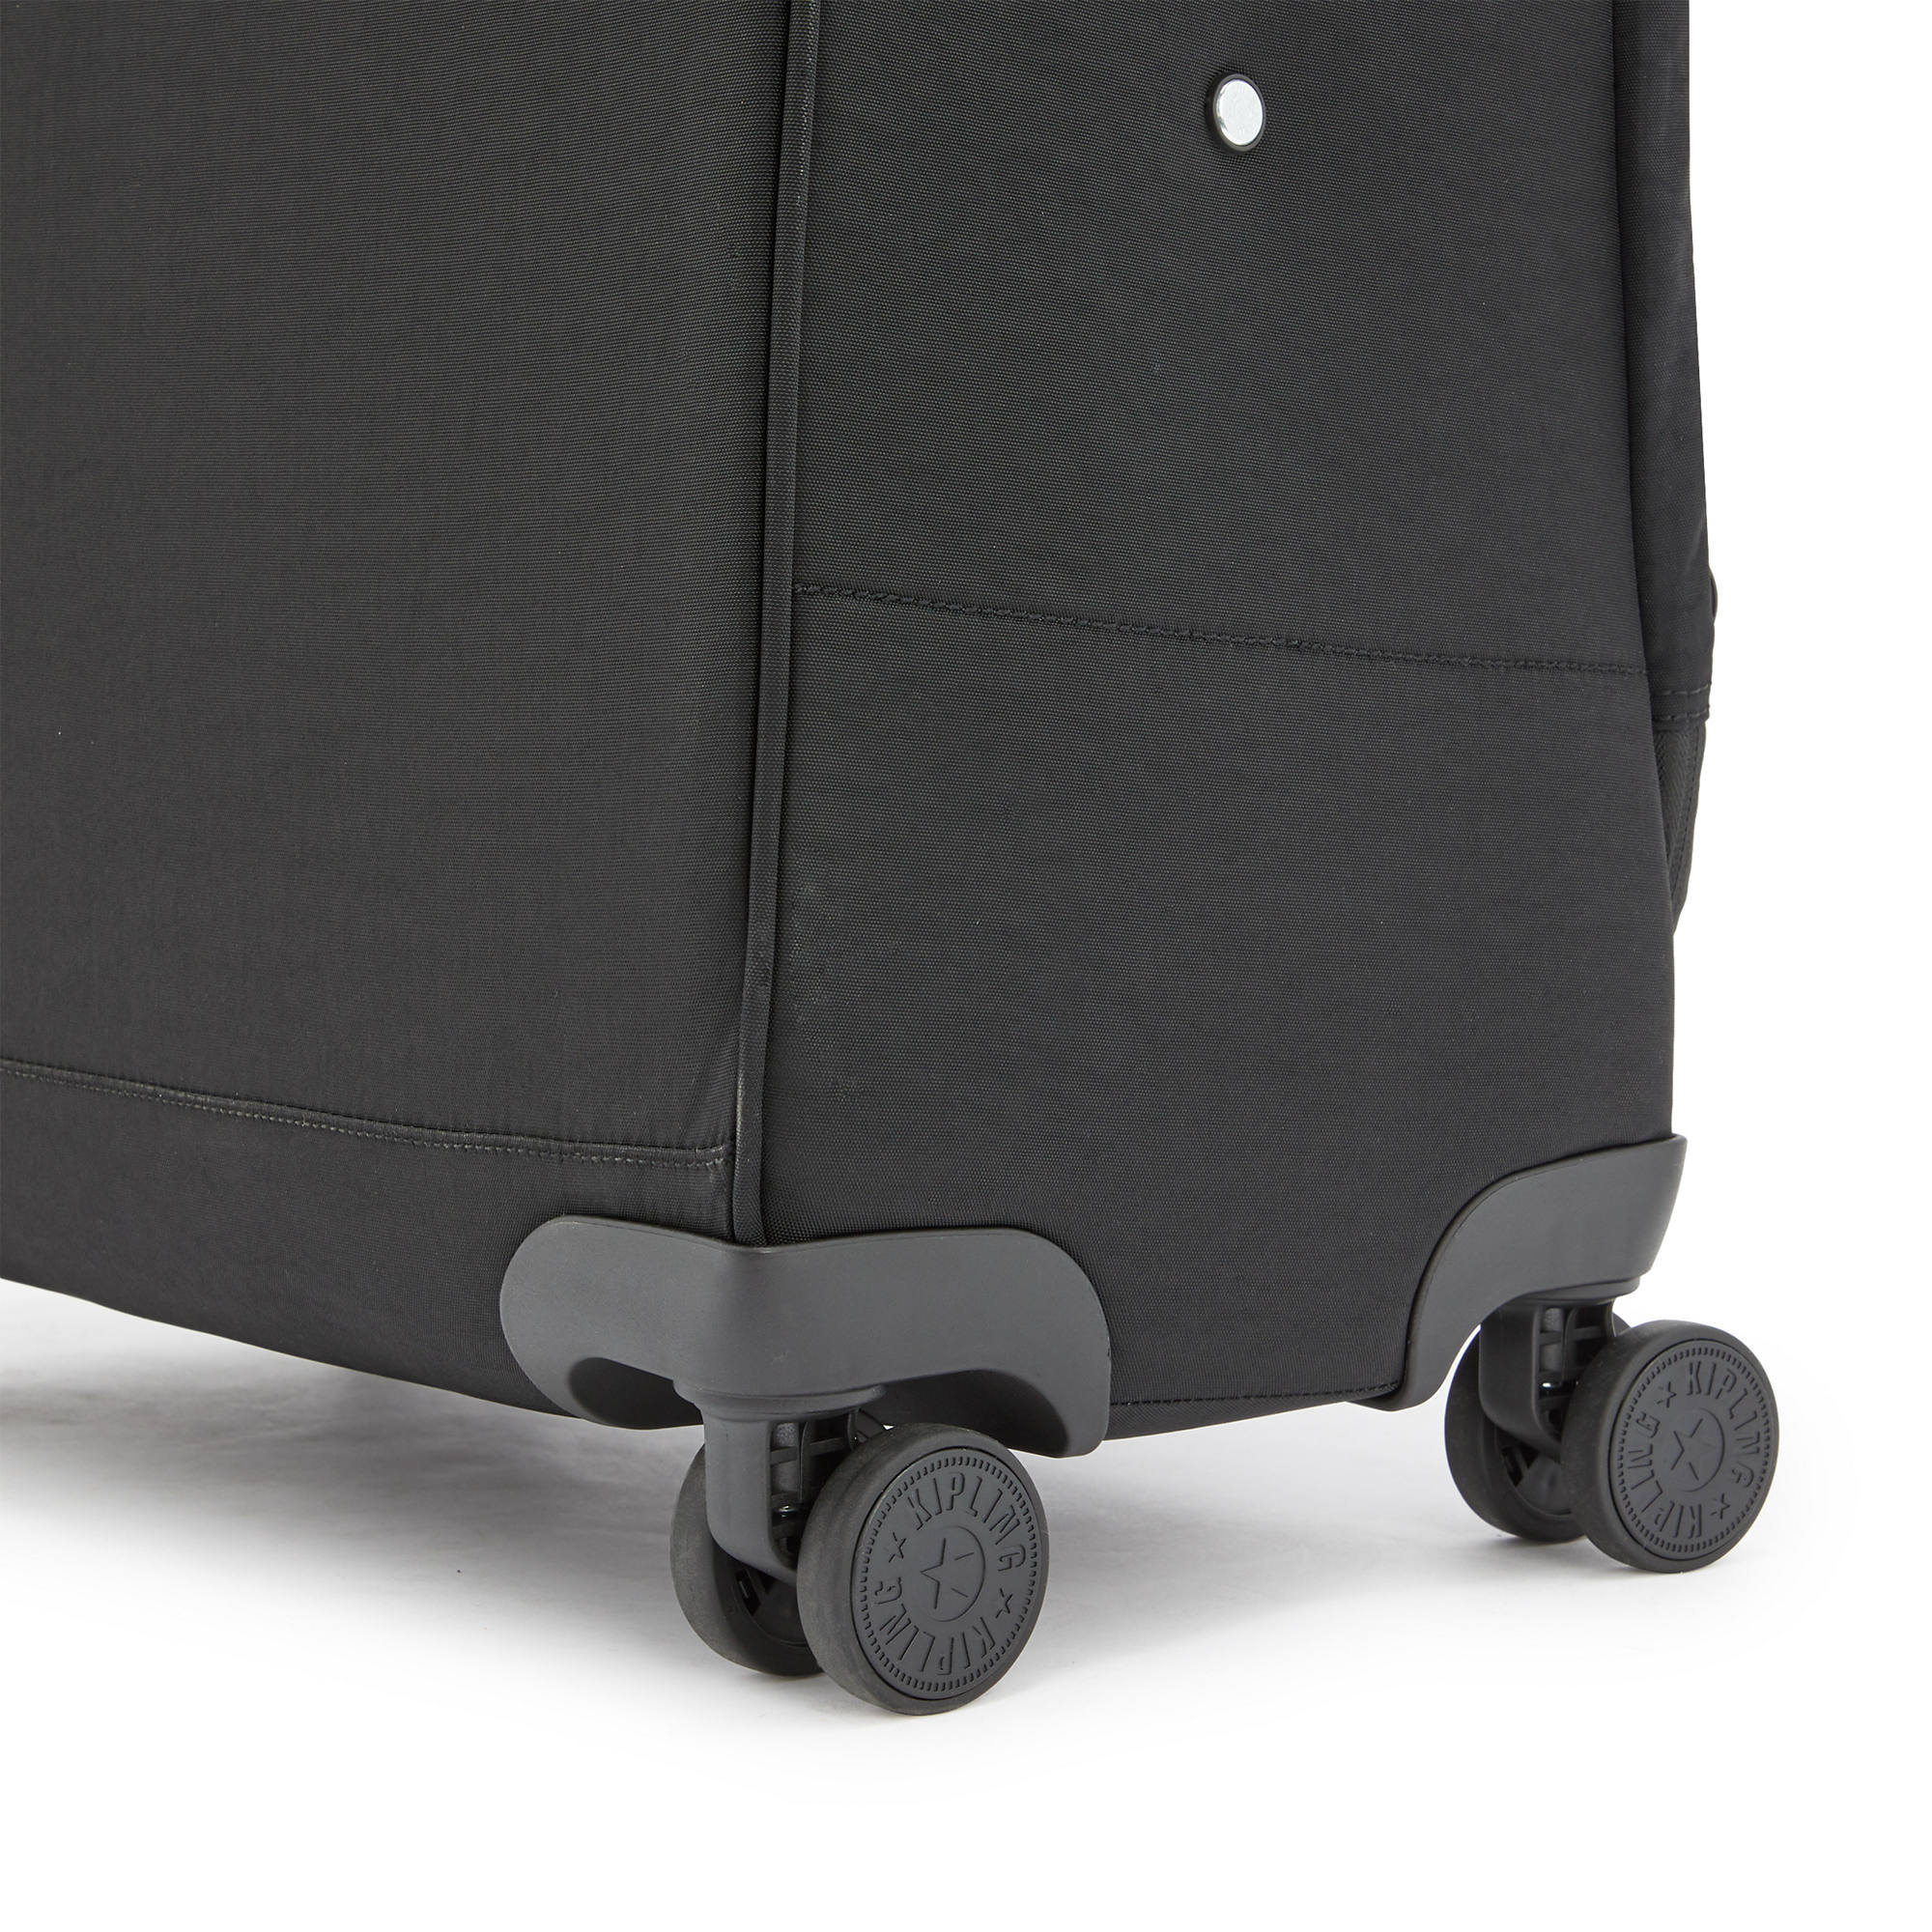 thumbnail 11 - Kipling City Spinner Medium Rolling Luggage